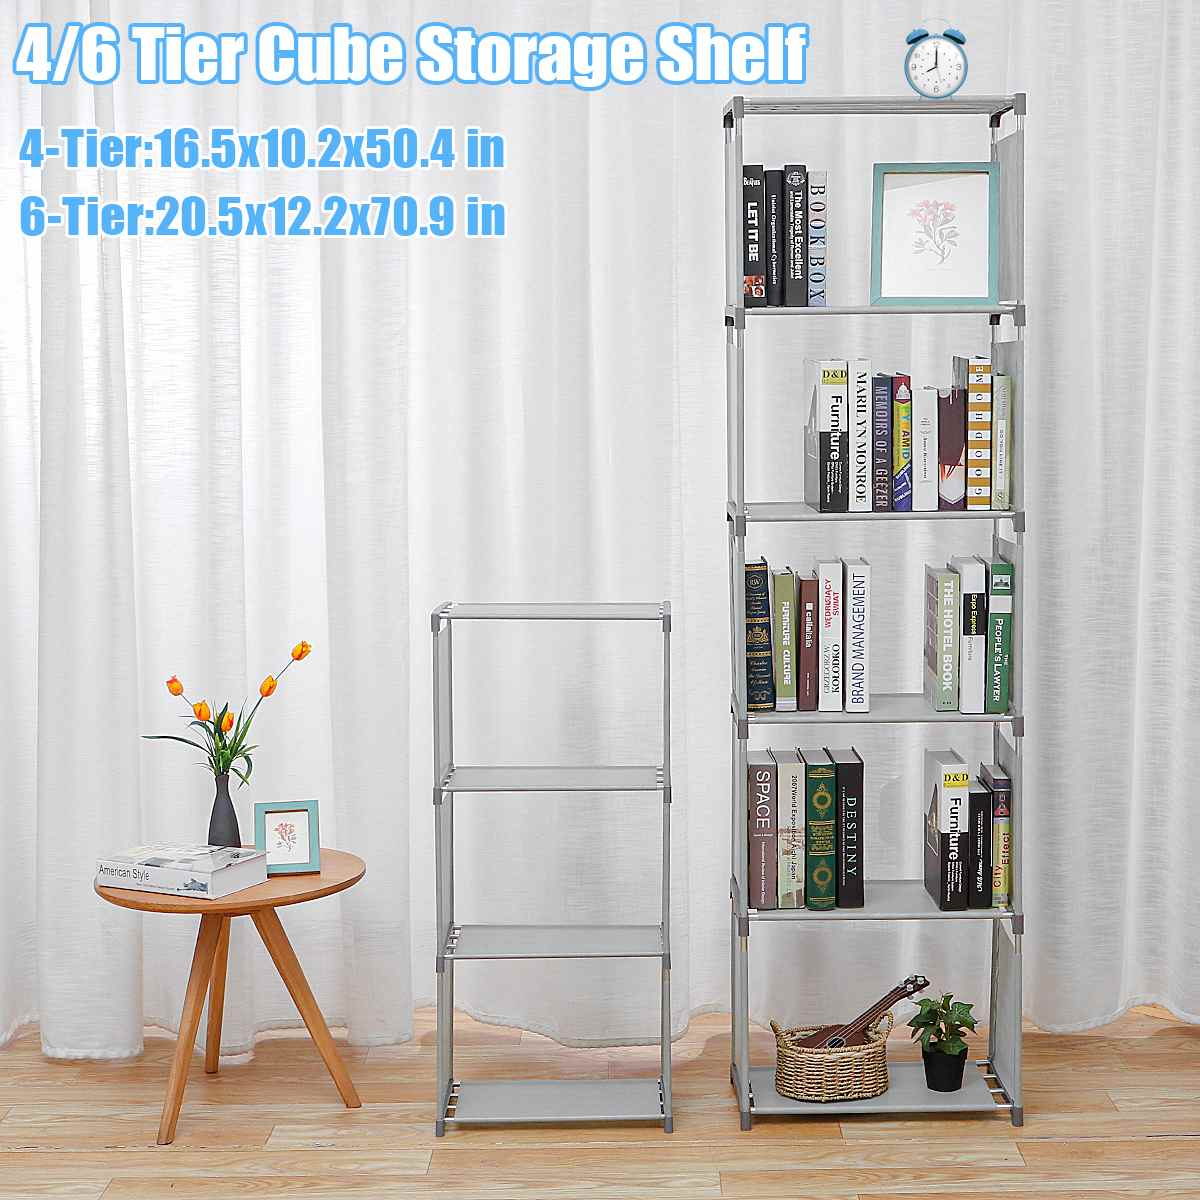 Cube DIY Bookcase 9-Shelf Storage Shelving Ladder decor display Bedroom Office